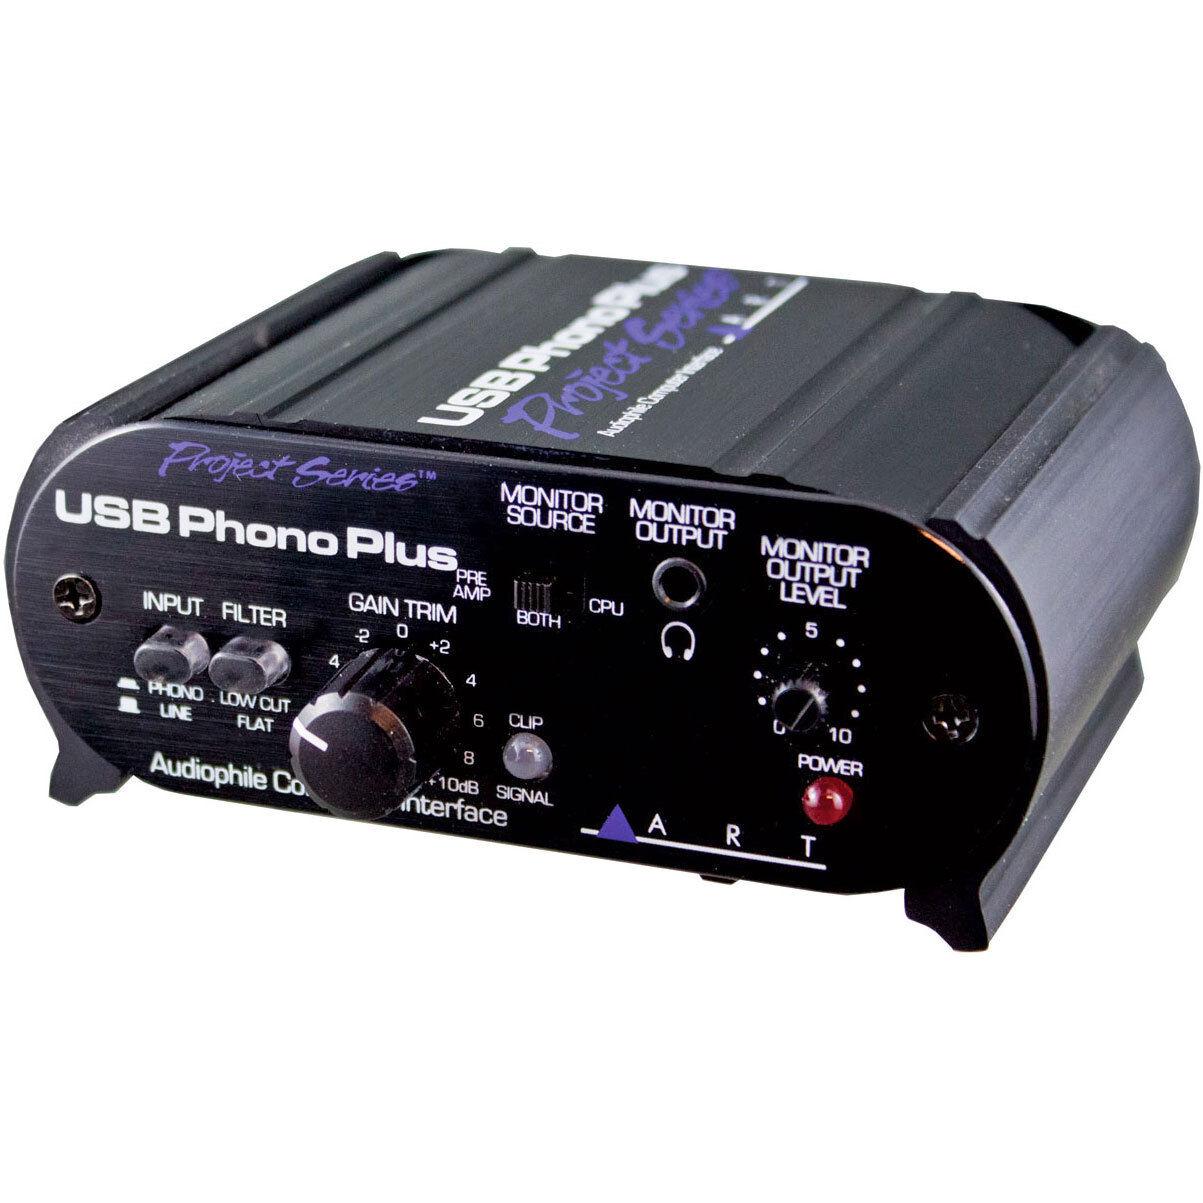 7. ART USB Phono Plus